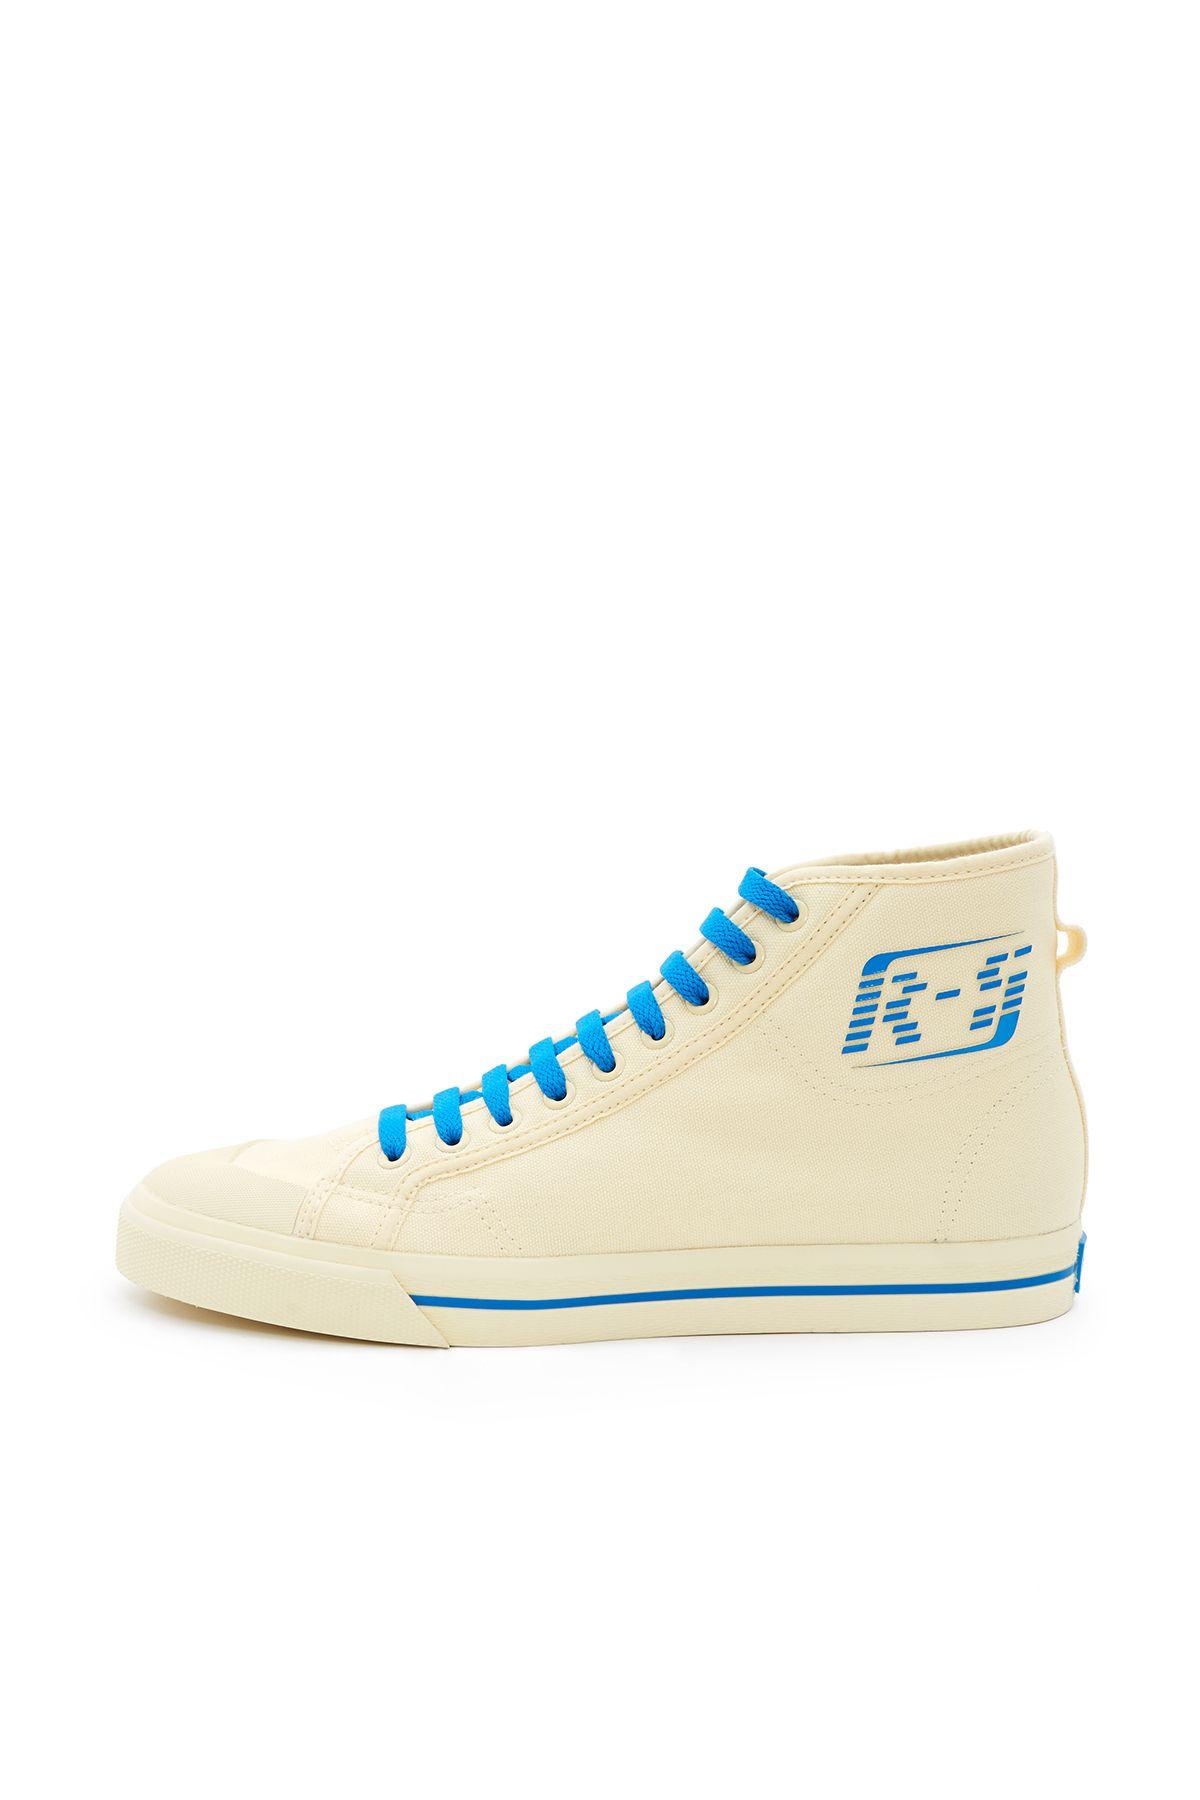 adidas daim patiner chaussures de sport pour hommes ebay